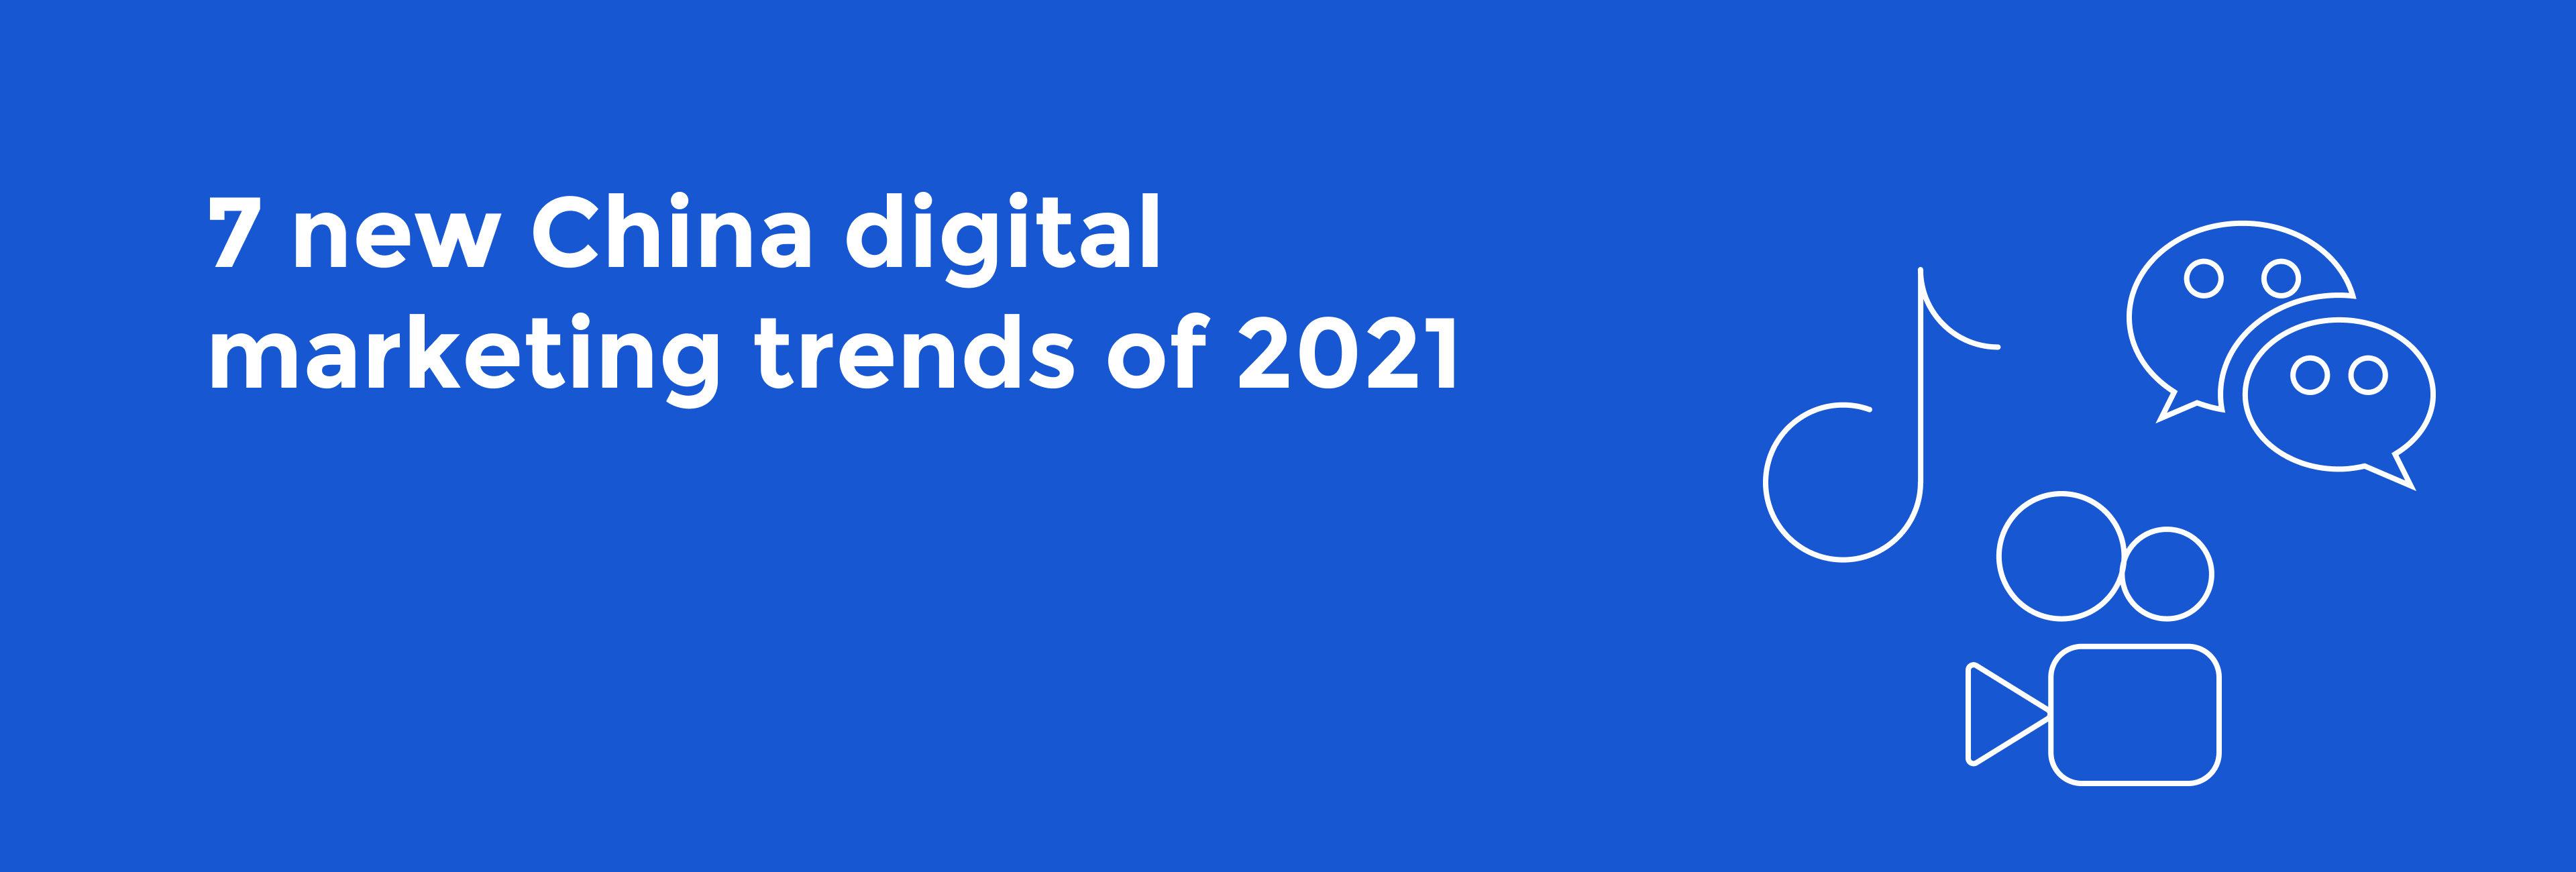 Digital Marketing Trends China